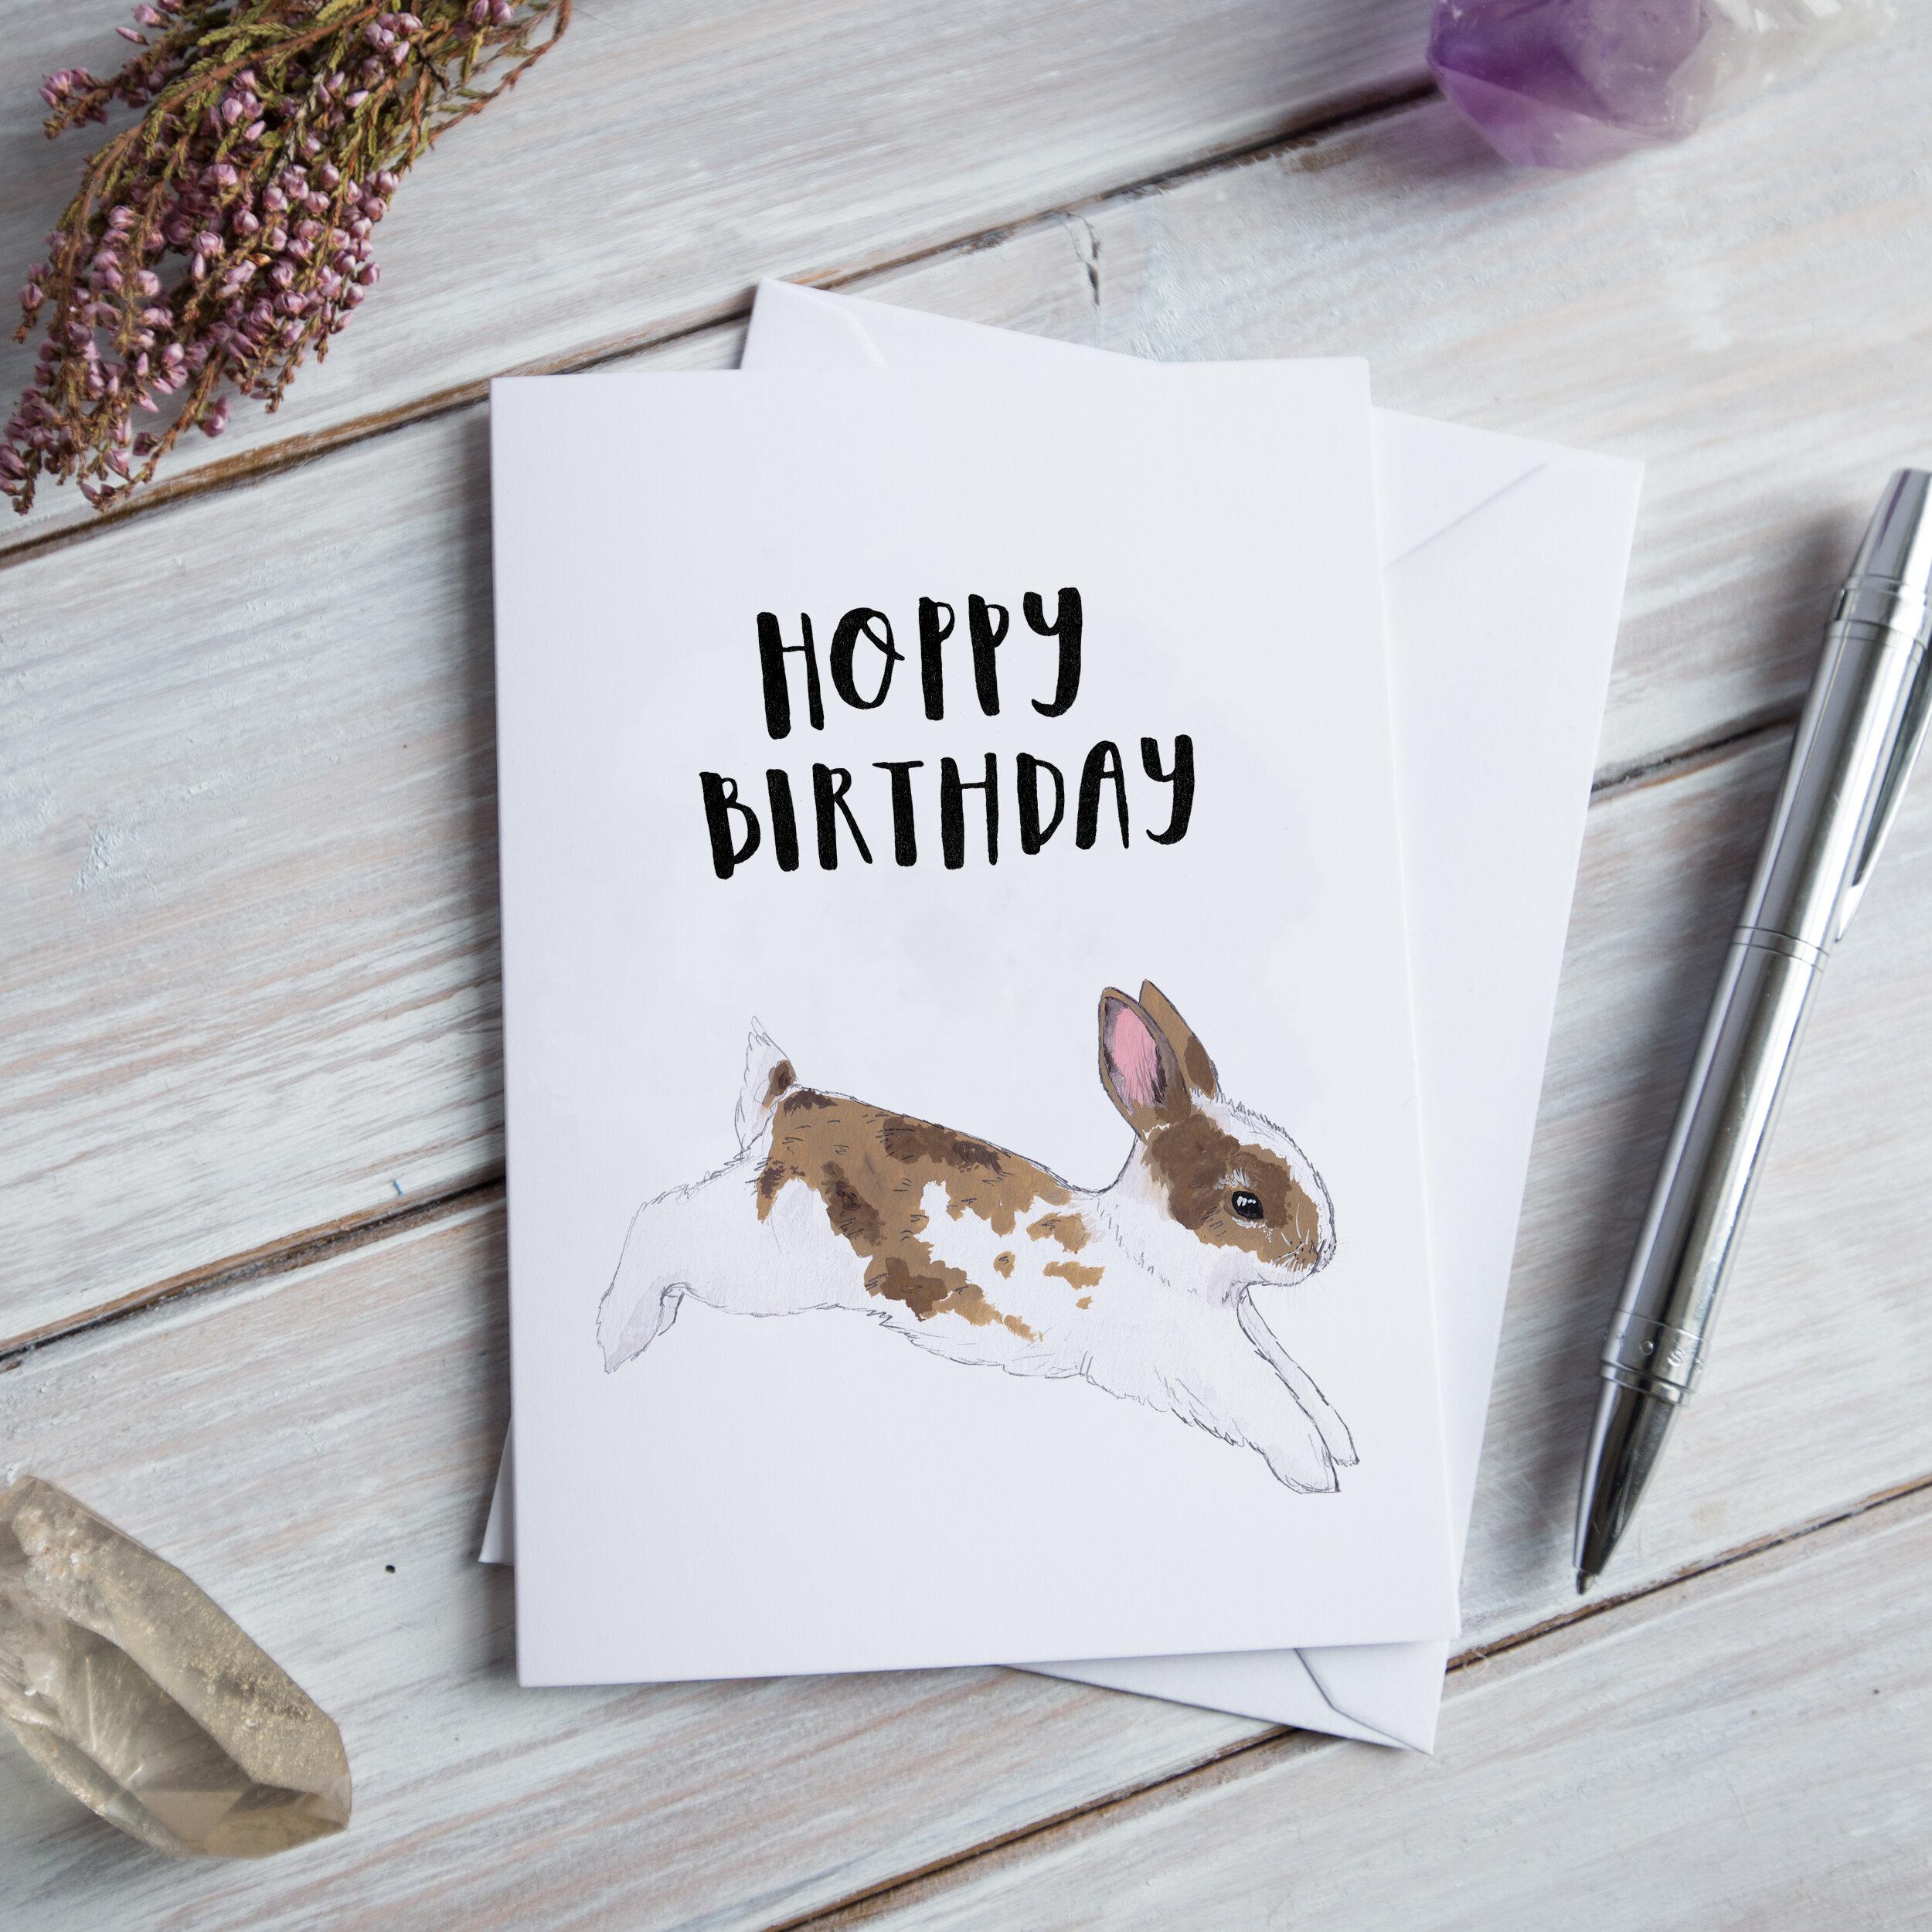 anyaraczkacards-hoppybirthday.jpg